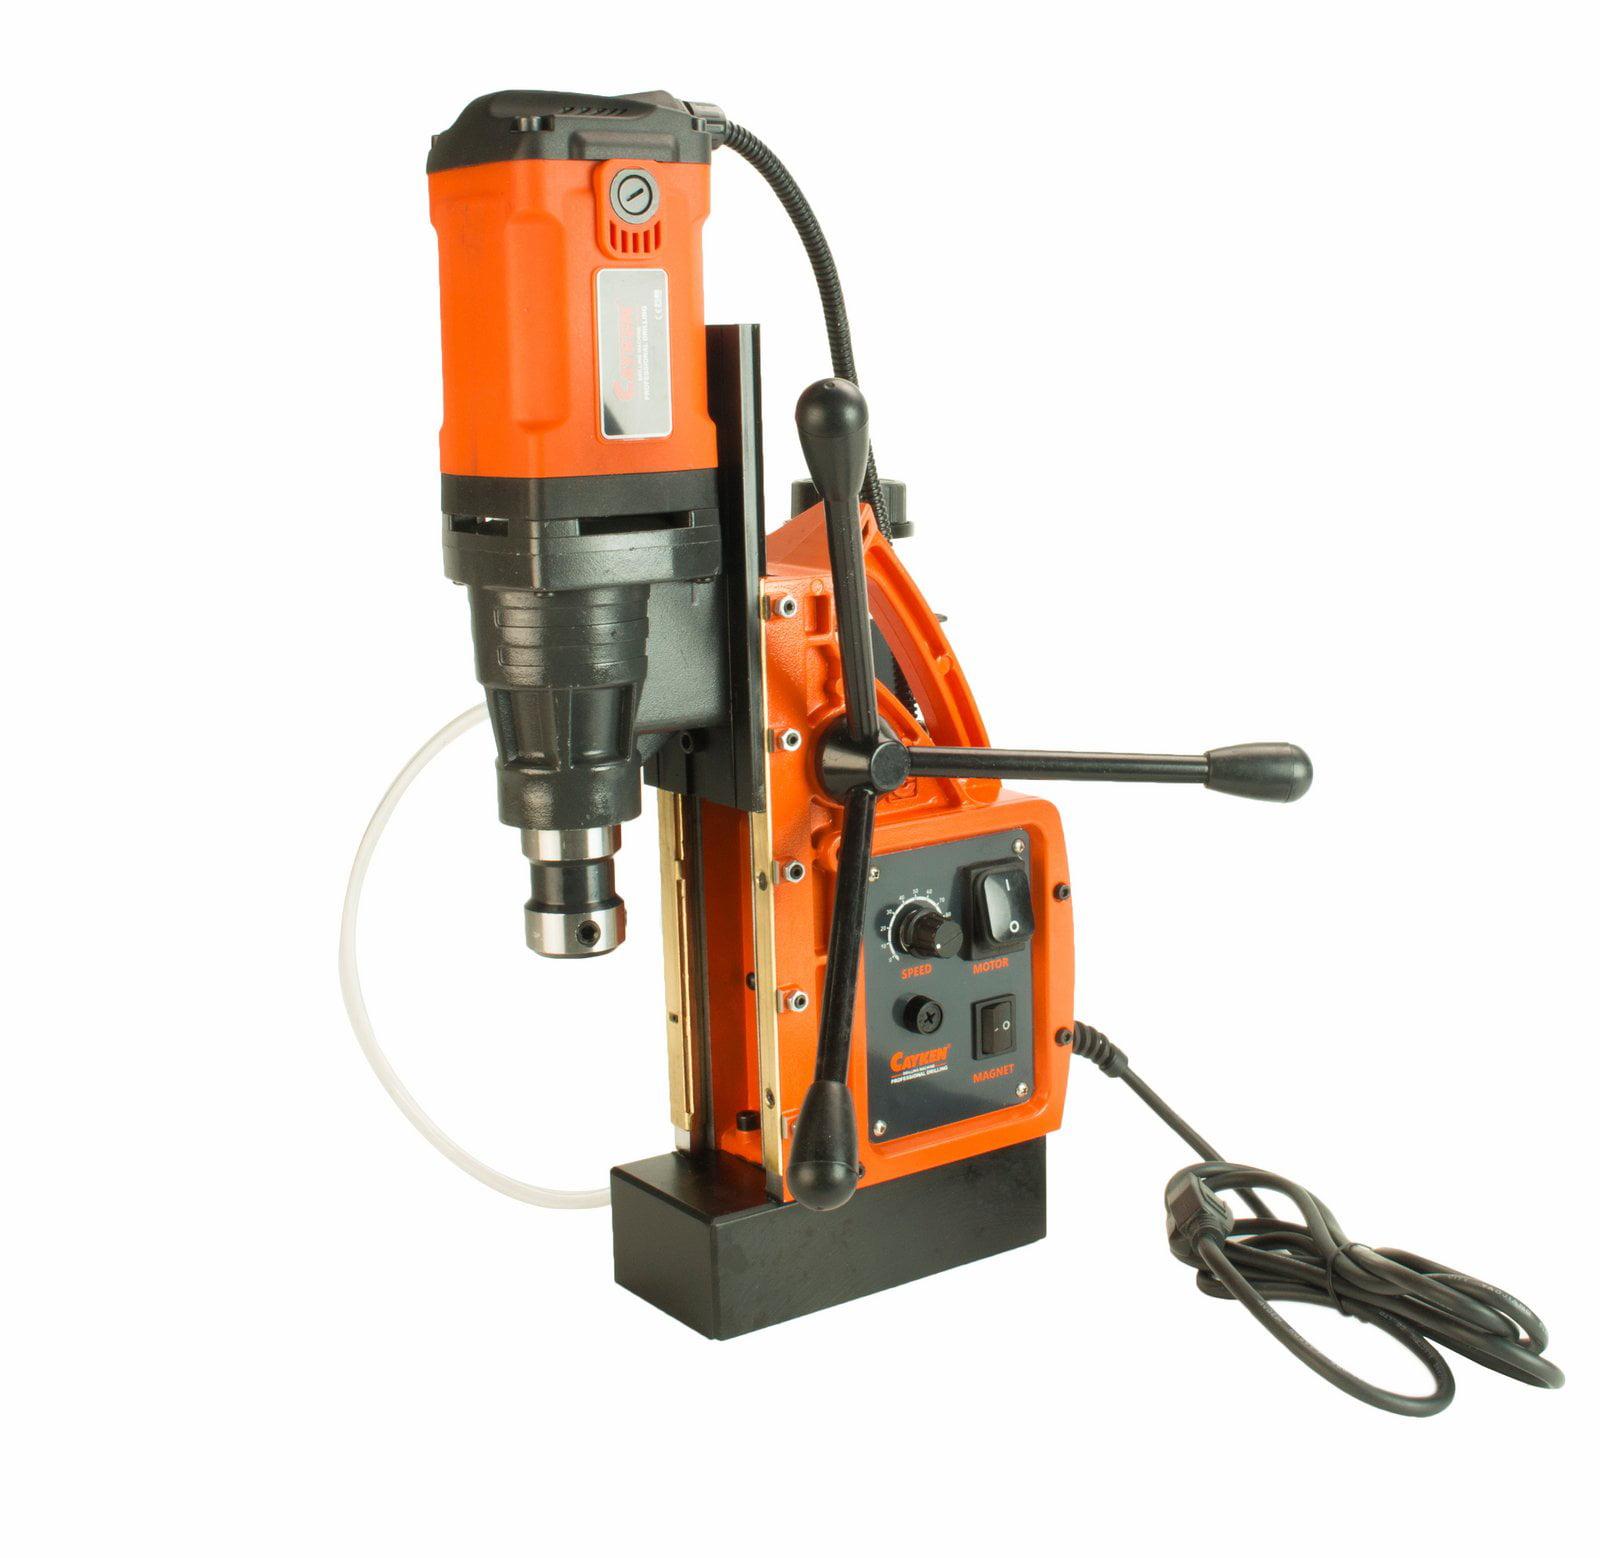 "Cayken SCY-42HD 1.65"" Magnetic Drill Press with Weldon Shank and 7 Piece Small Diameter 2"" Cut Depth... by Cayken"